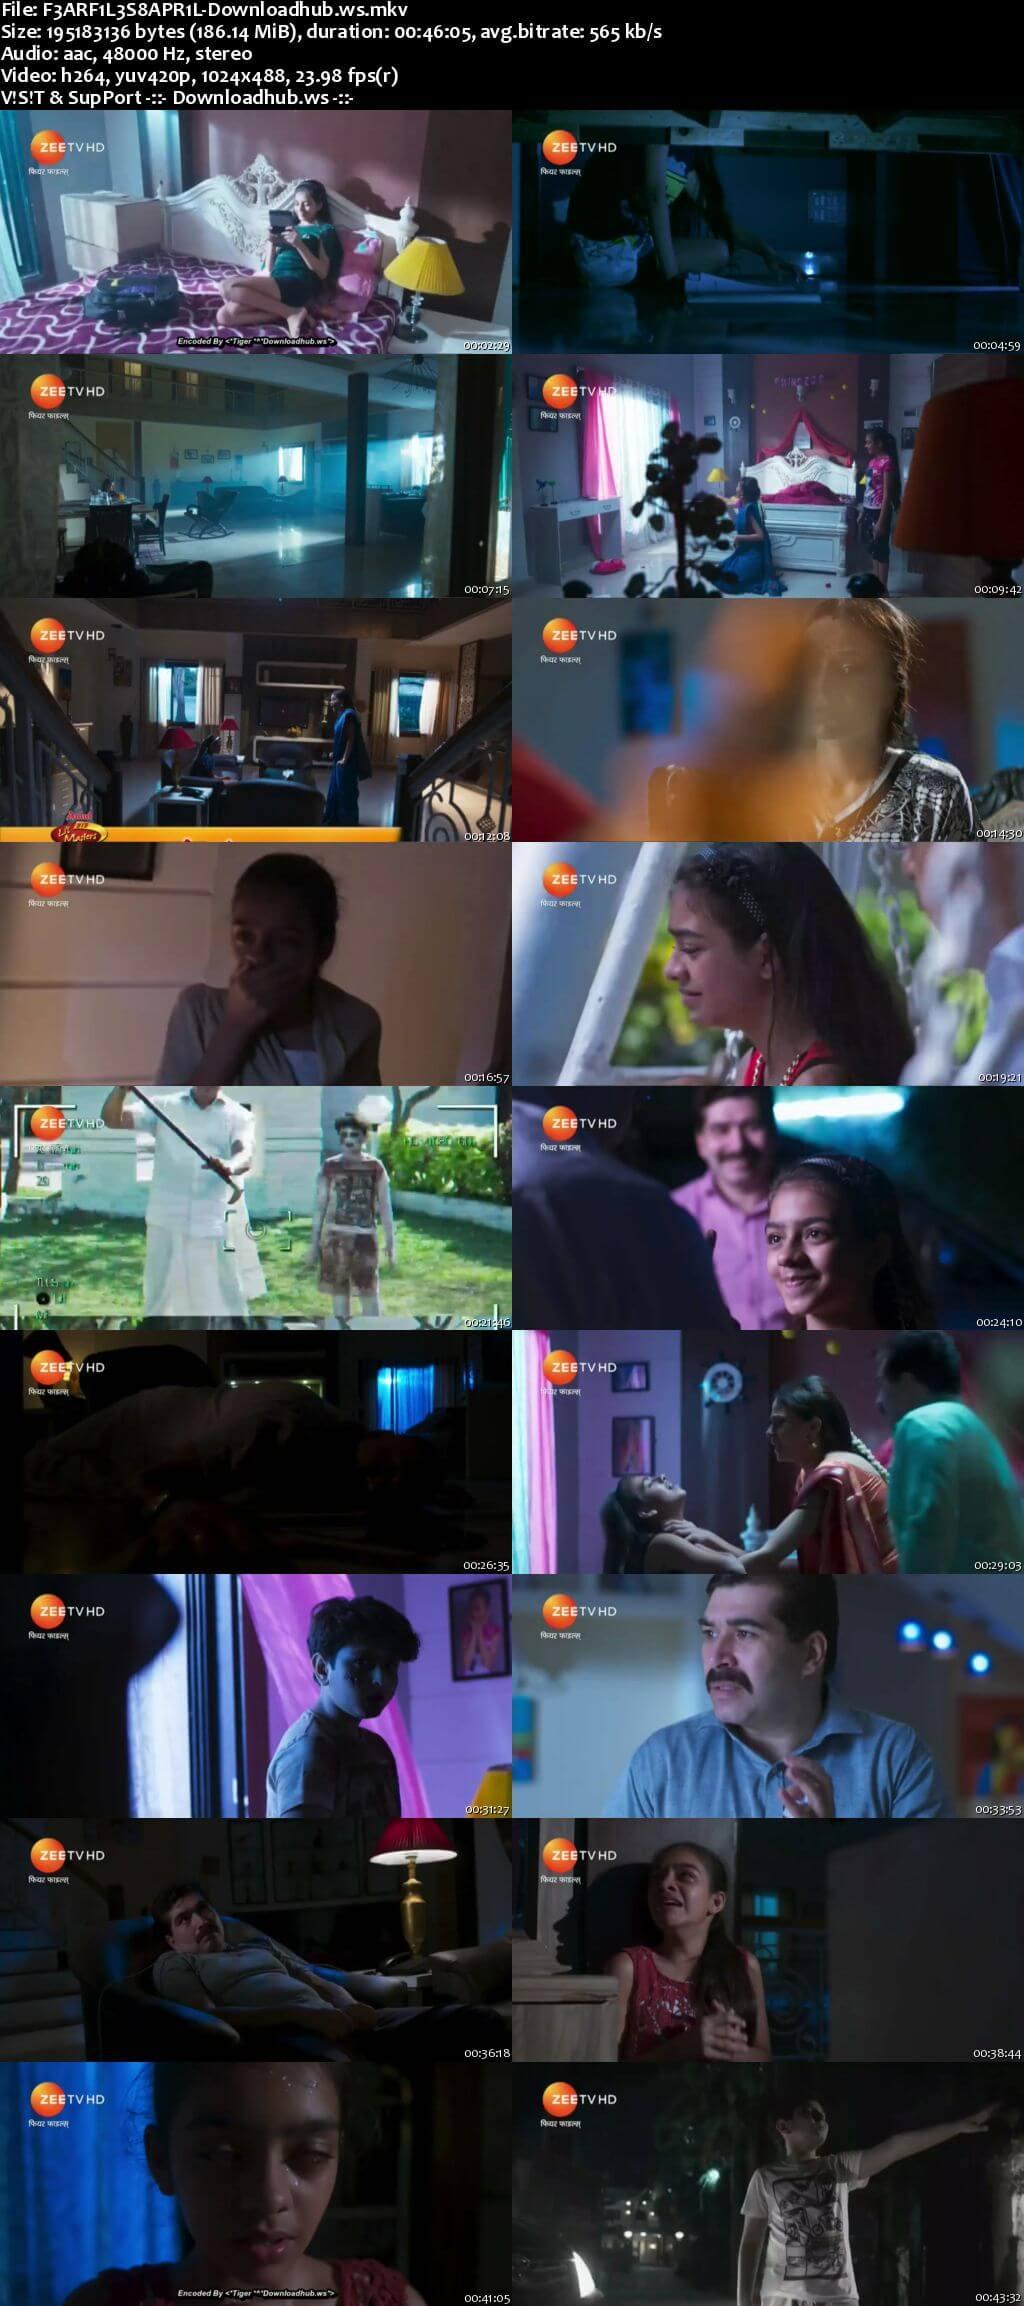 Fear Files 08 April 2018 480p HDTV Download